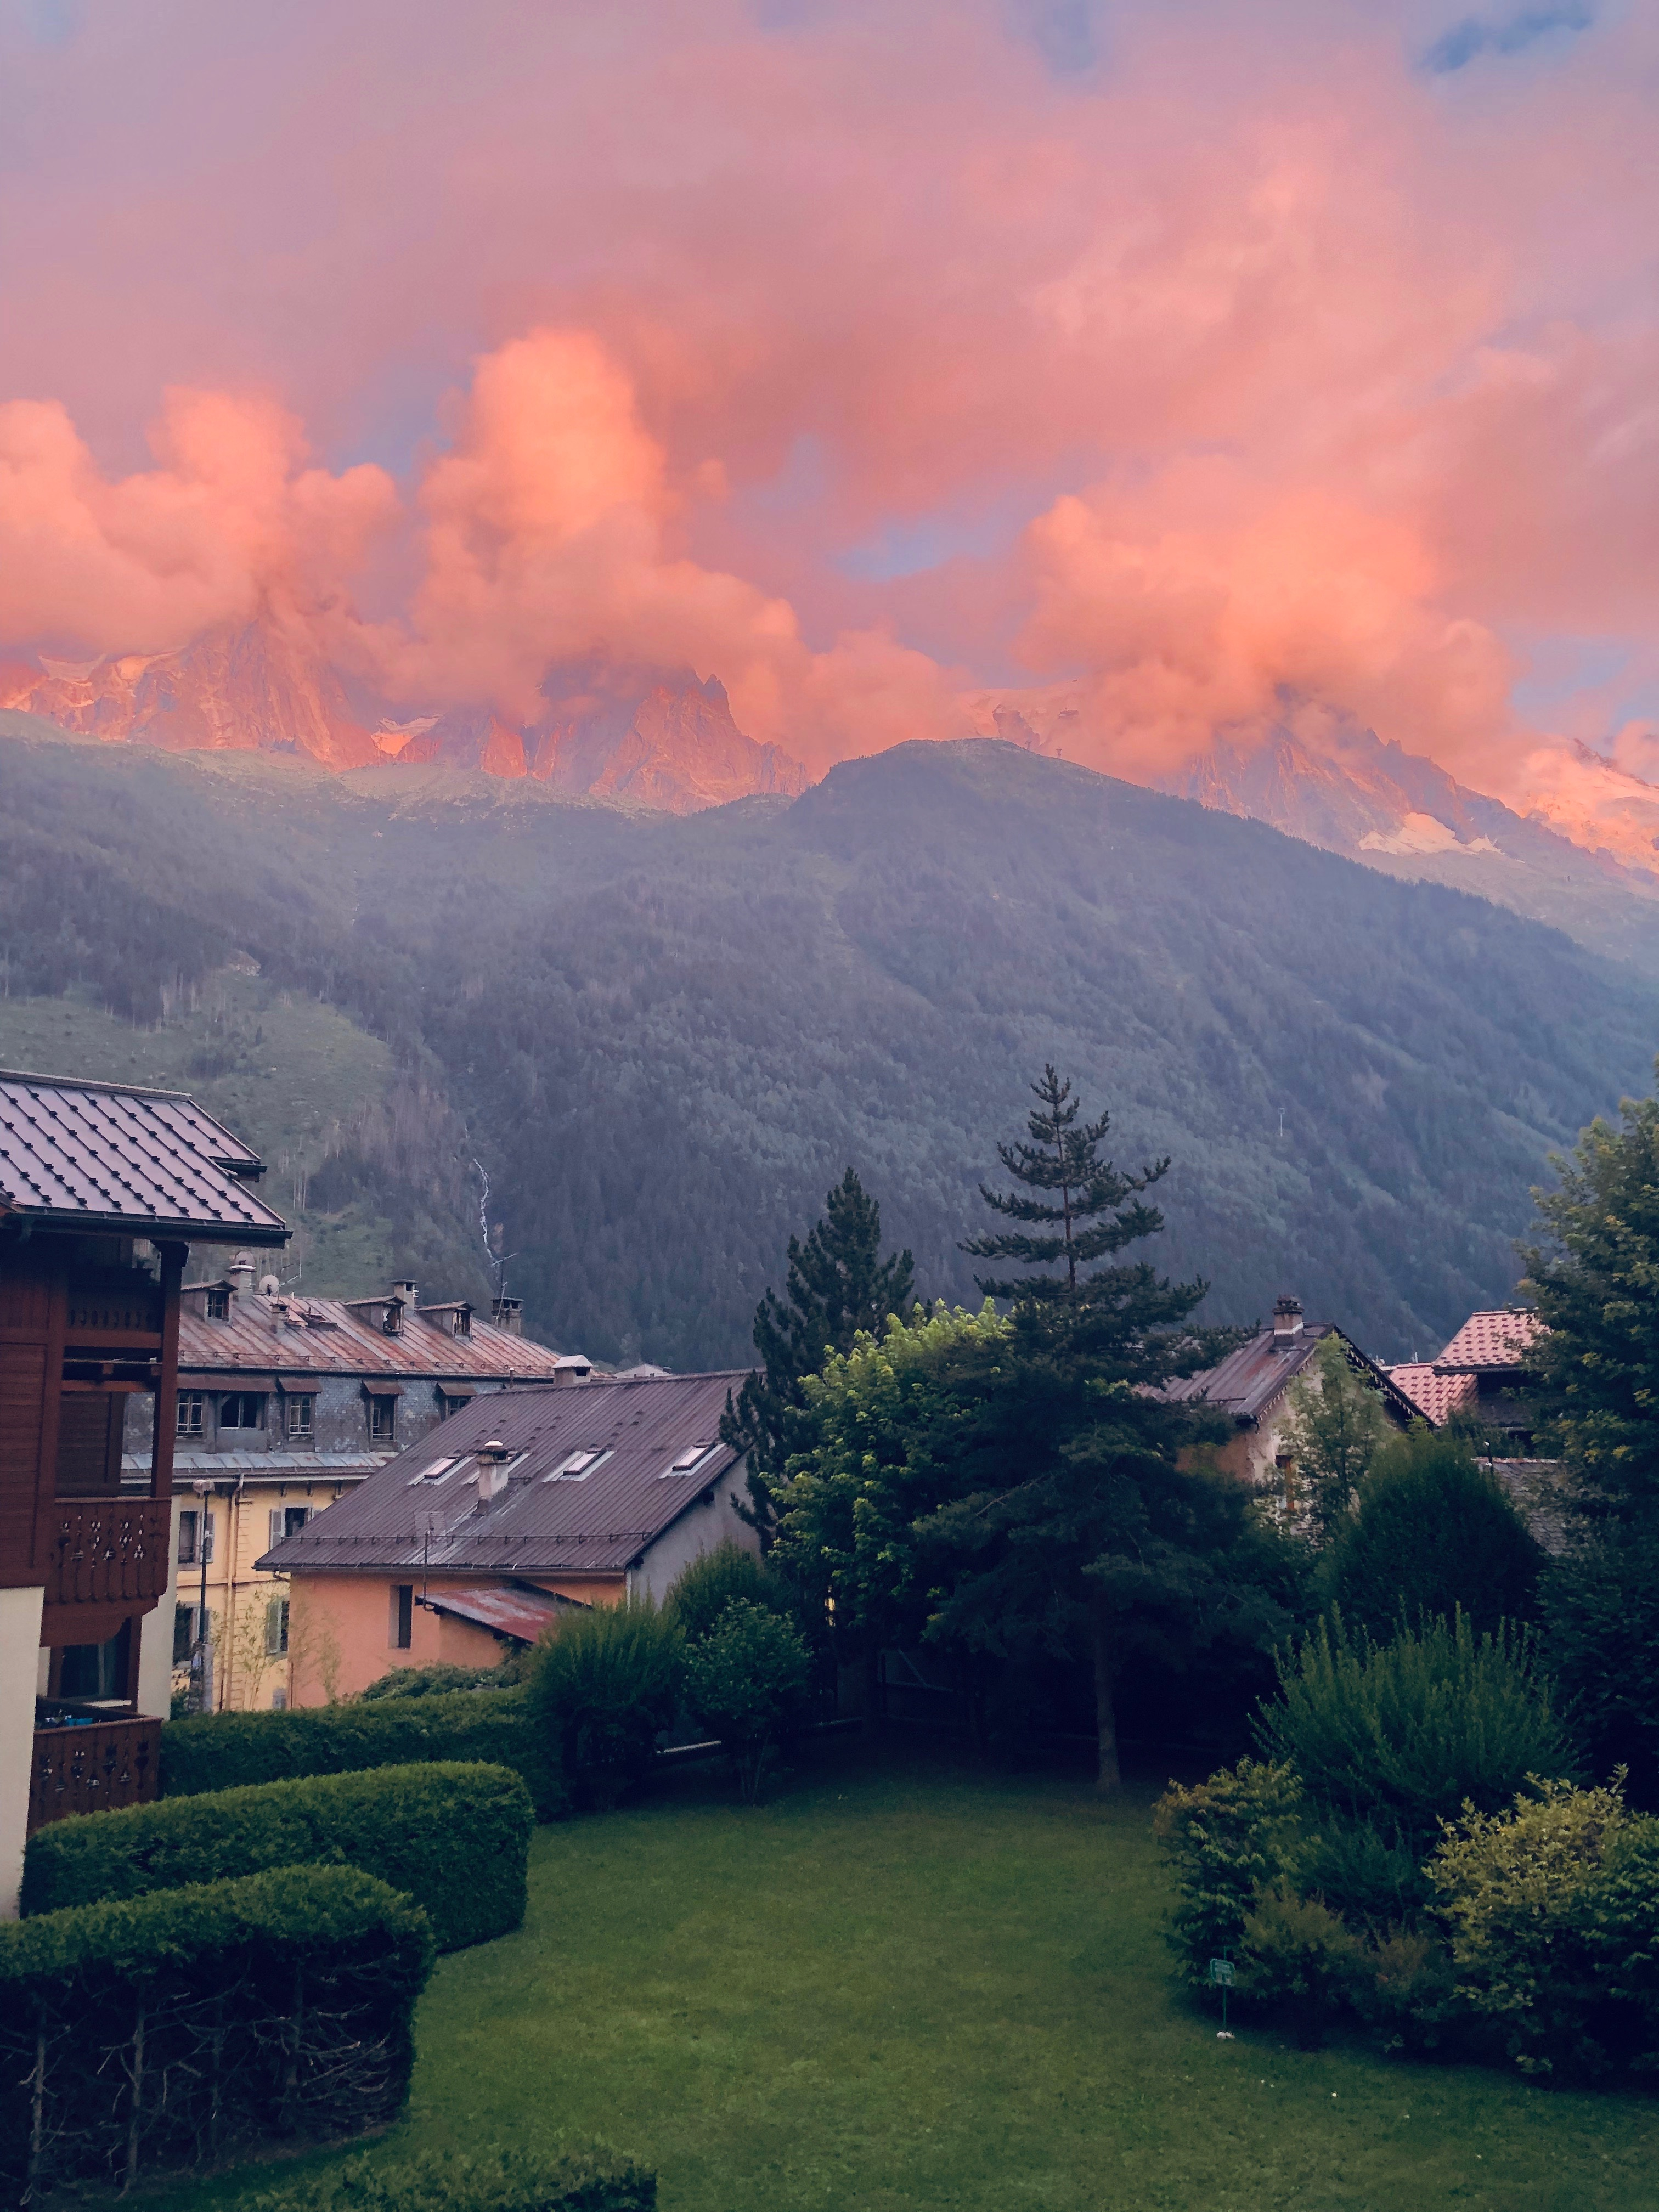 Cityguide Chamonix-Mont-Blanc